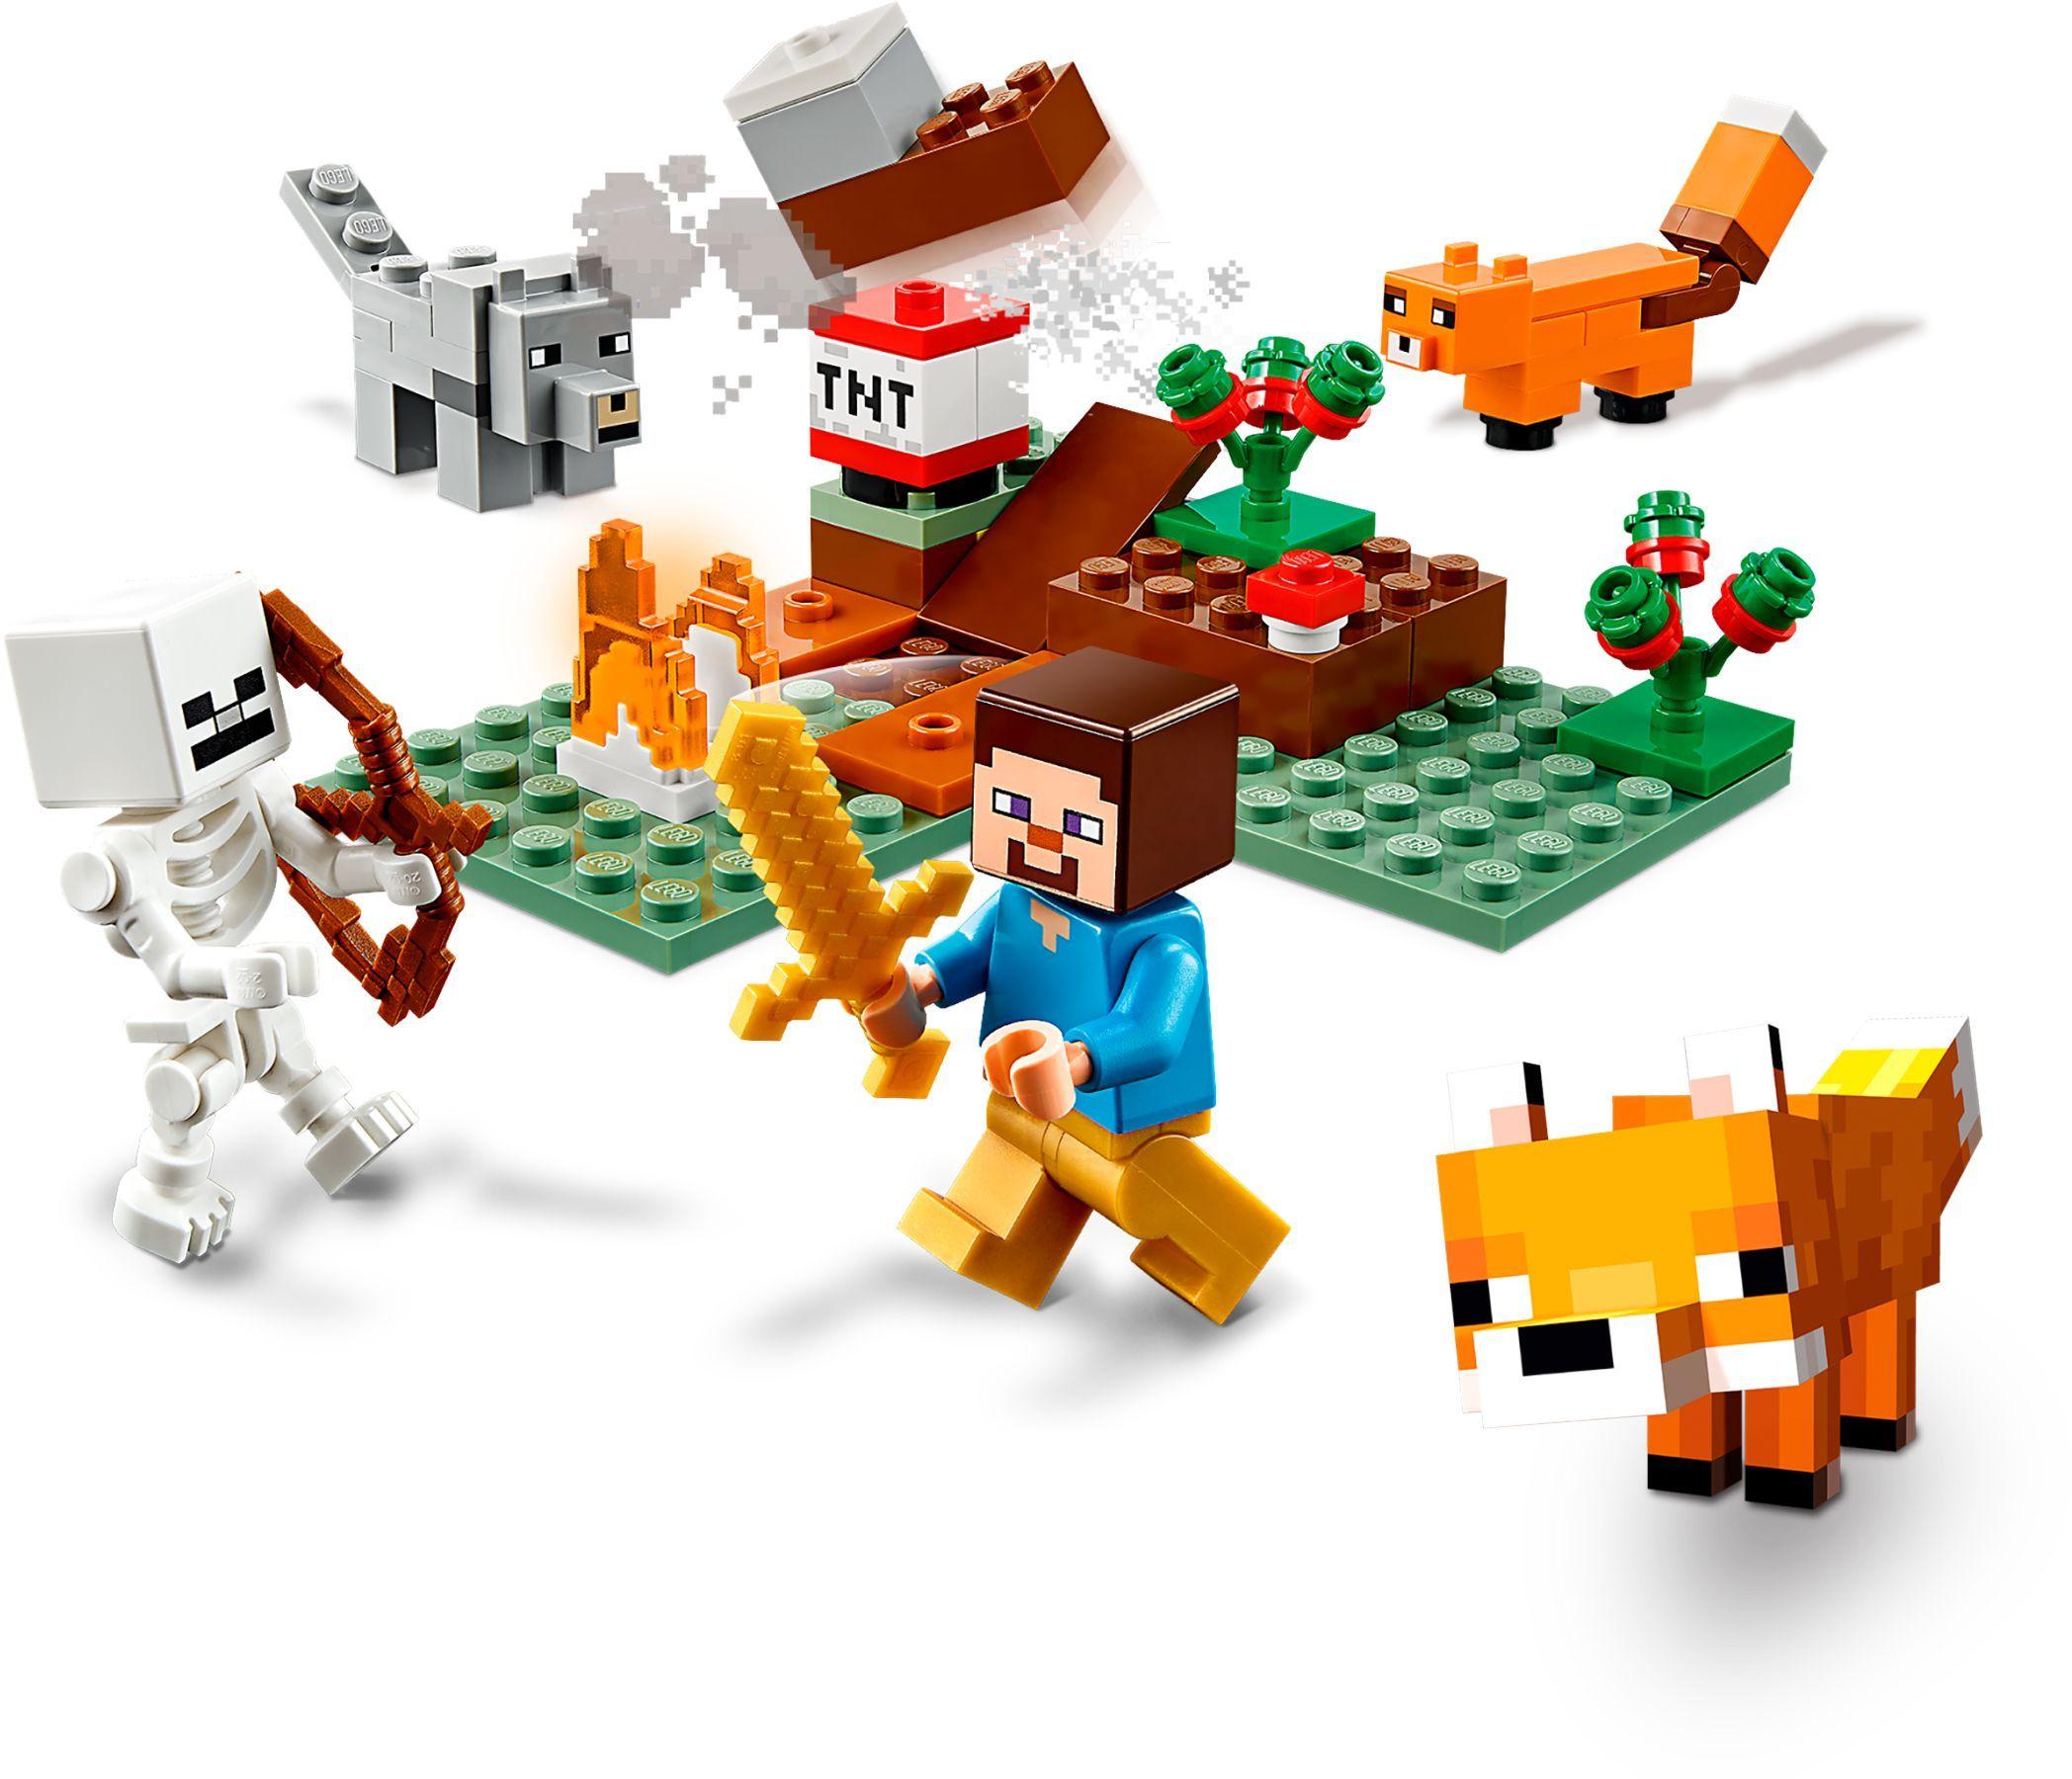 21162 LEGO Minecraft Tajgaäventyret